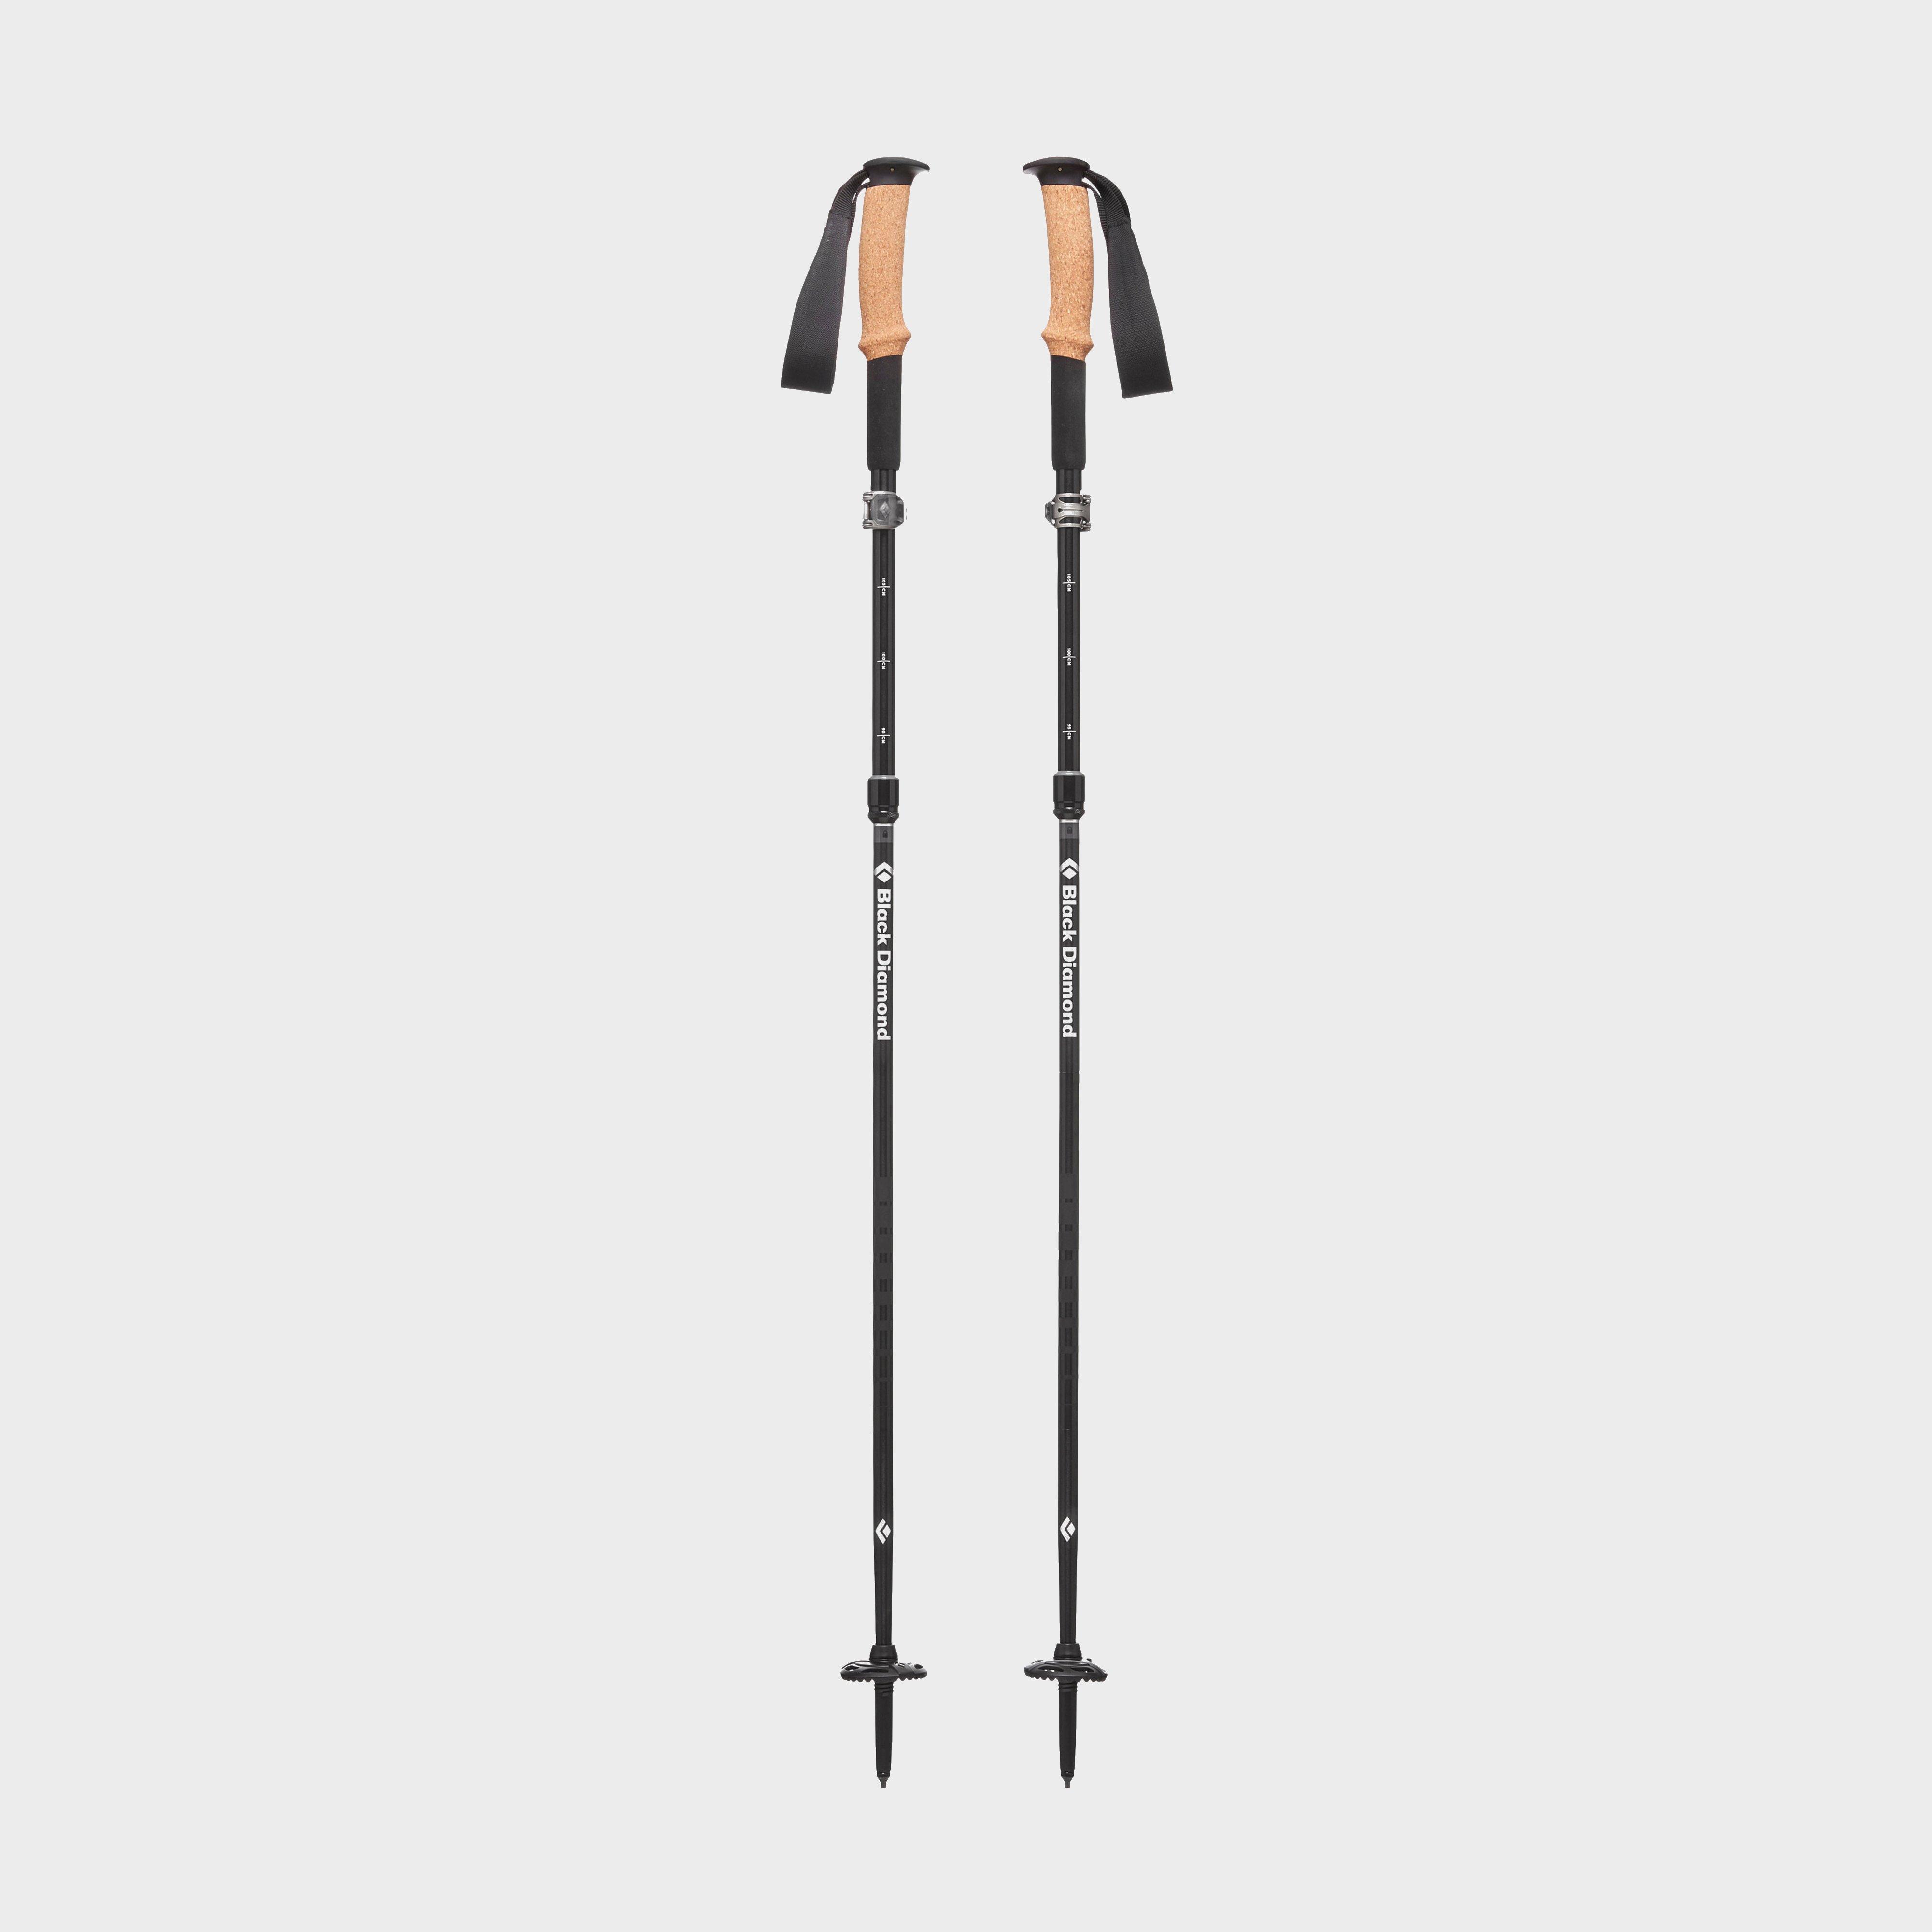 Black Diamond Alpine Flz Trekking Poles (105-125Cm) - Black/105-12, Black